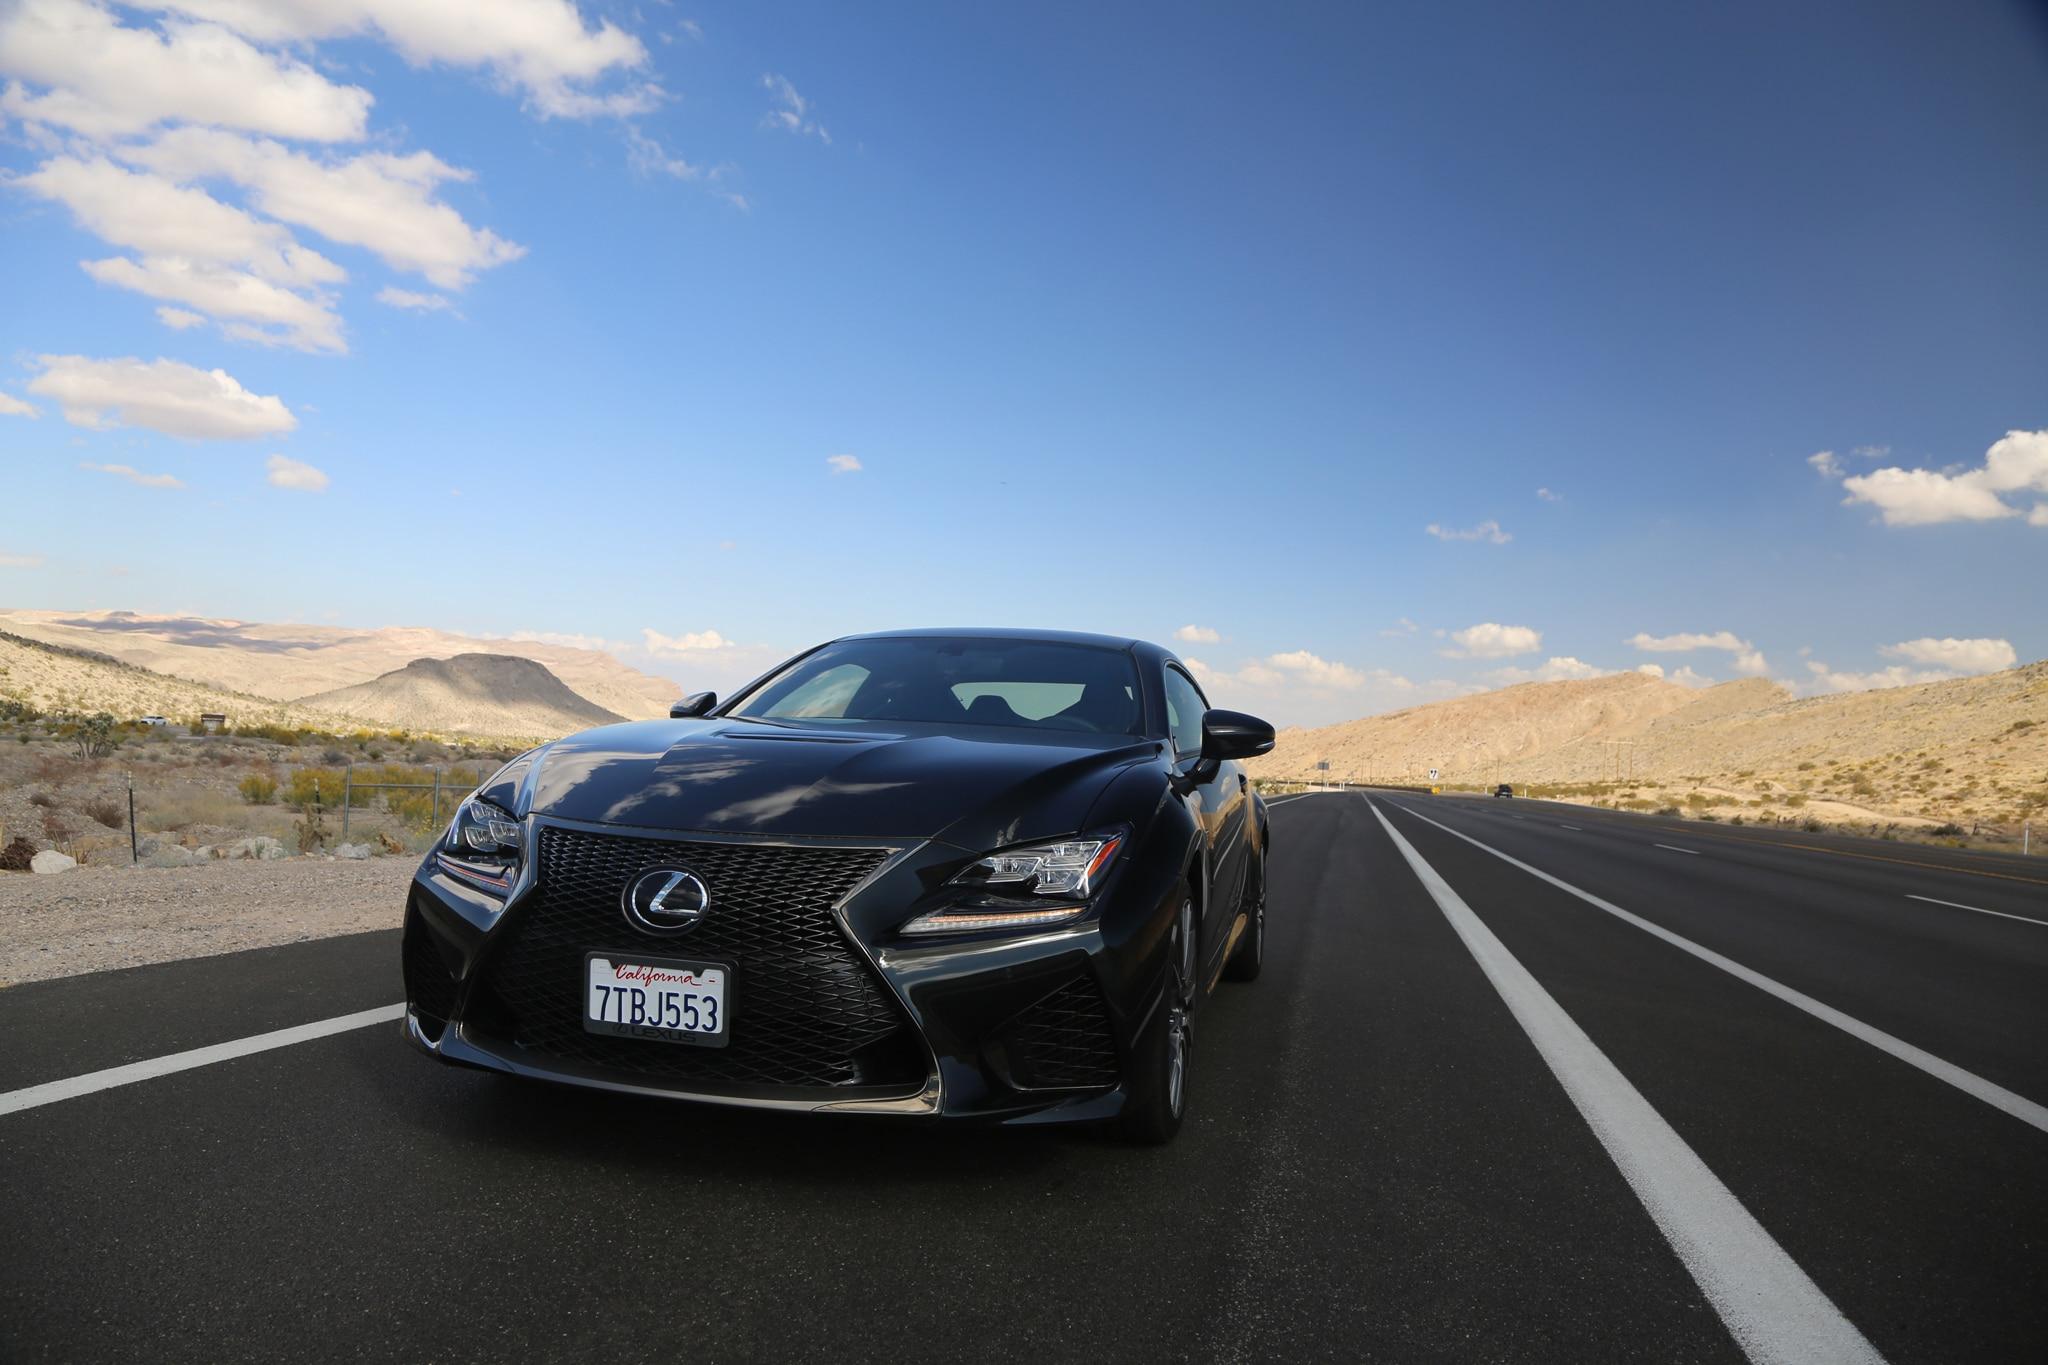 gear review car lexus reviews top rc interior